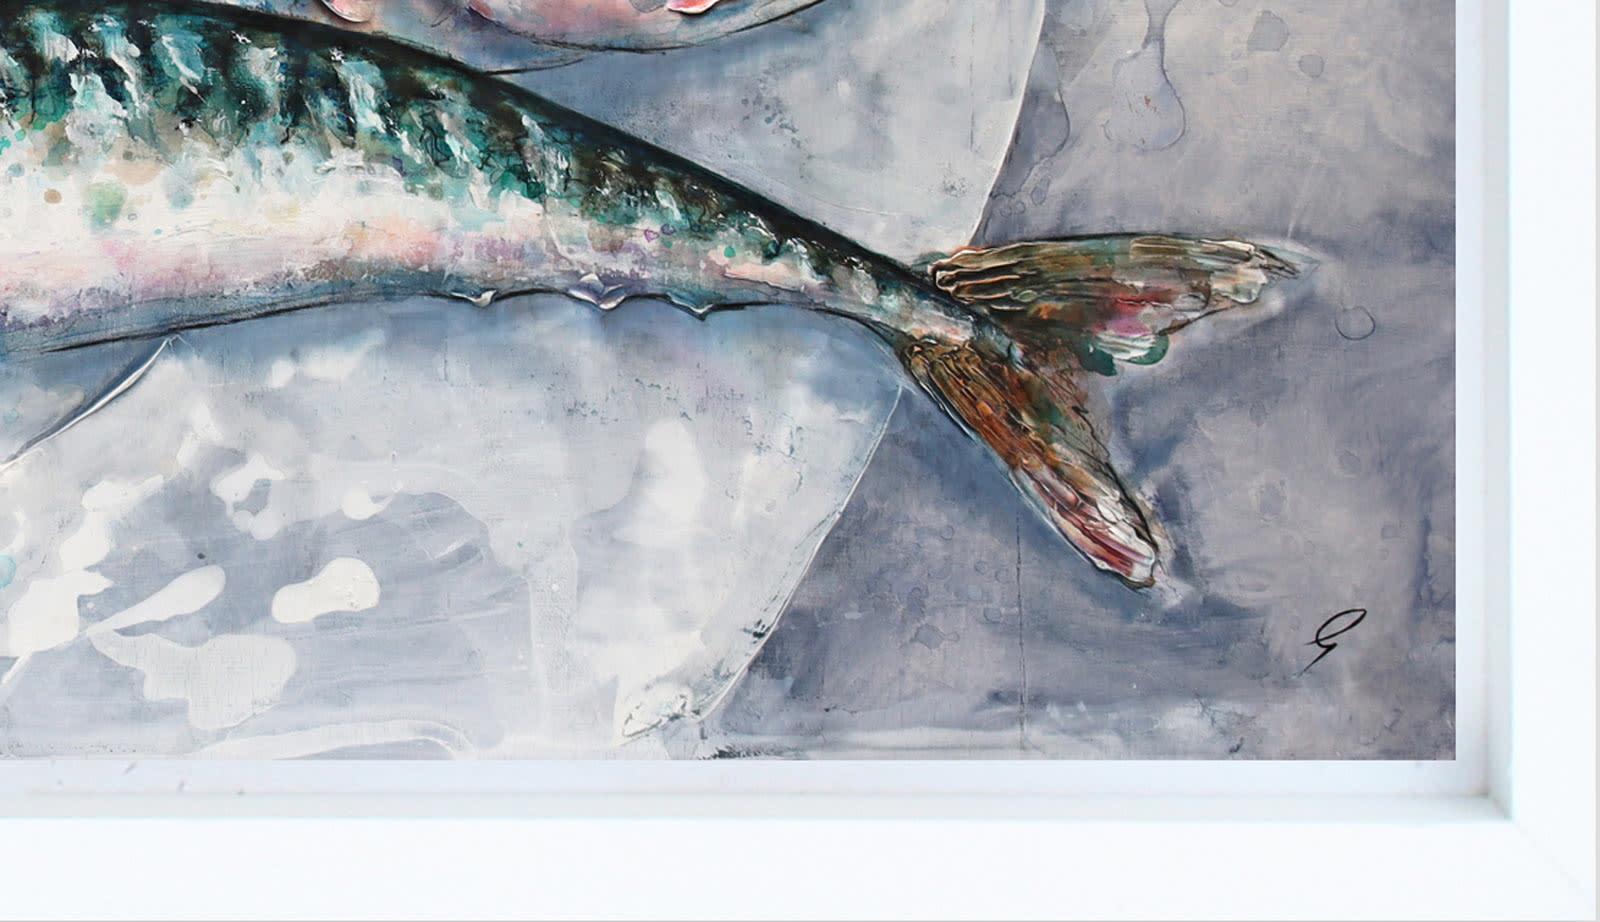 Three Mackerel On A Plate